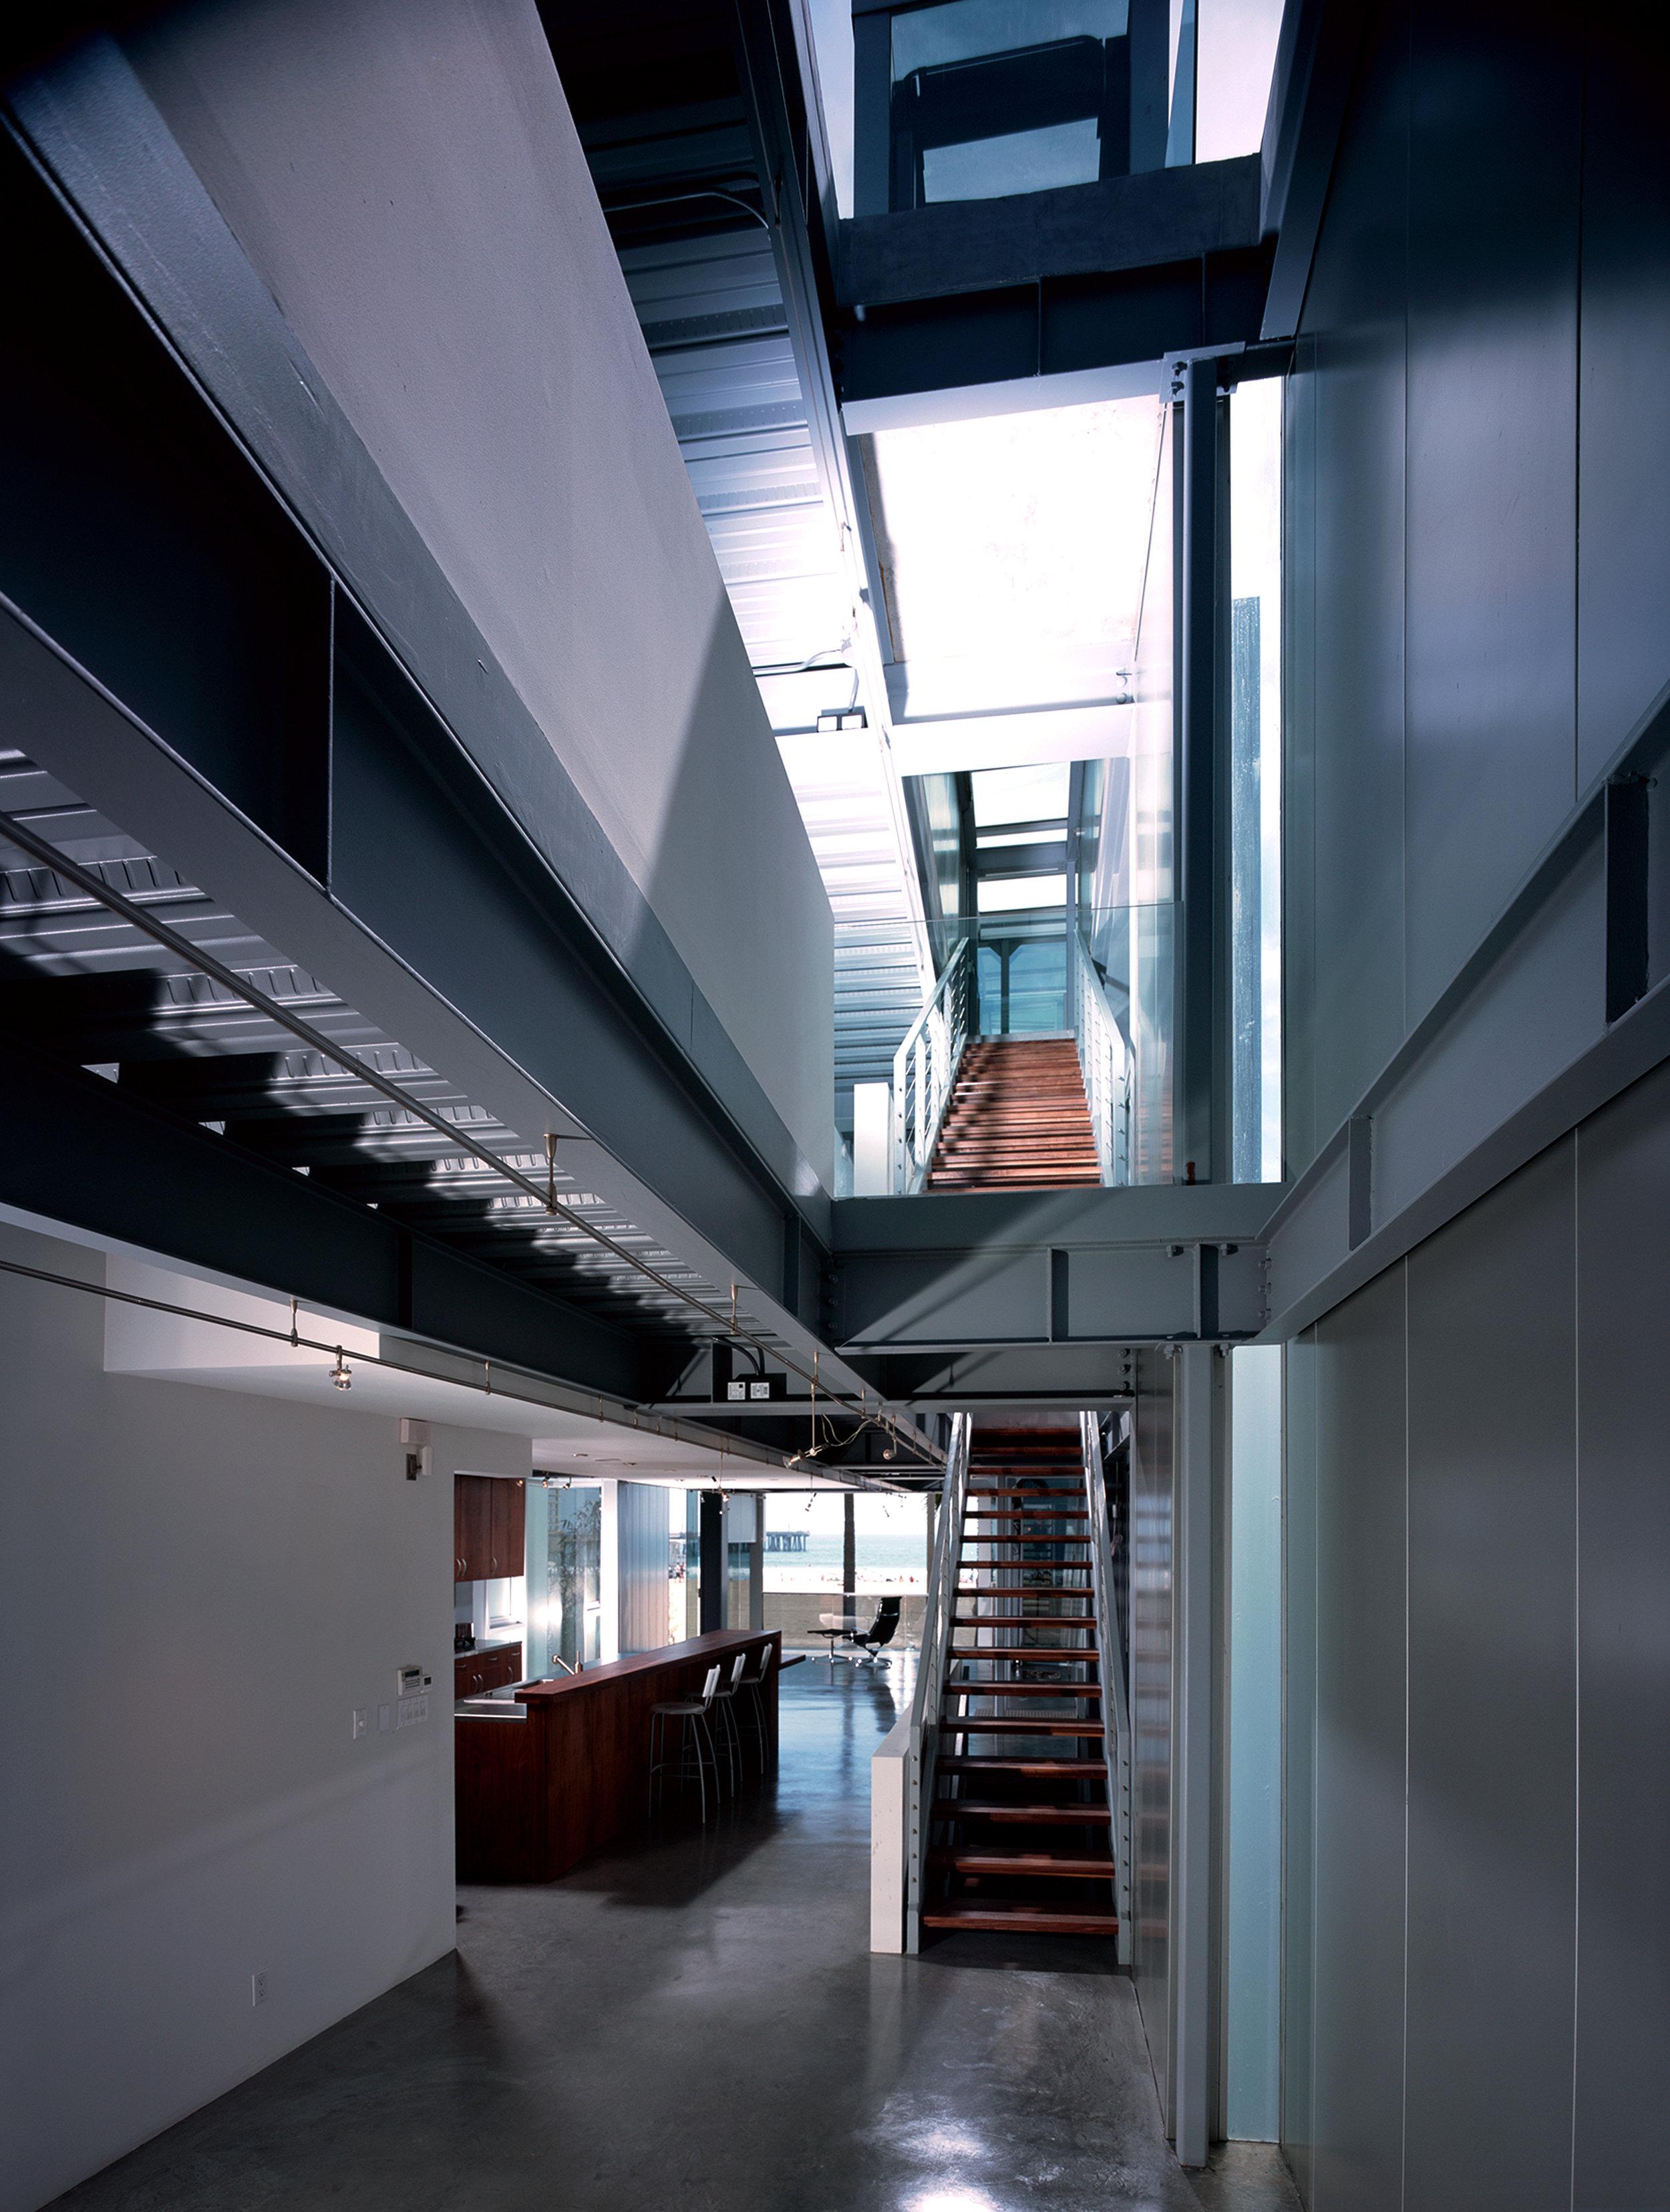 S.E.A.-Studio-Environmental-Architecture-David-Hertz-FAIA-Panel-House-Venice-Beach-California-sustainable-regenerative-restorative-green-design-prefabricated-aluminum-refrigeration-open-concept-ocean-view-residential-glass-steel-sunset-interior-6.jpg